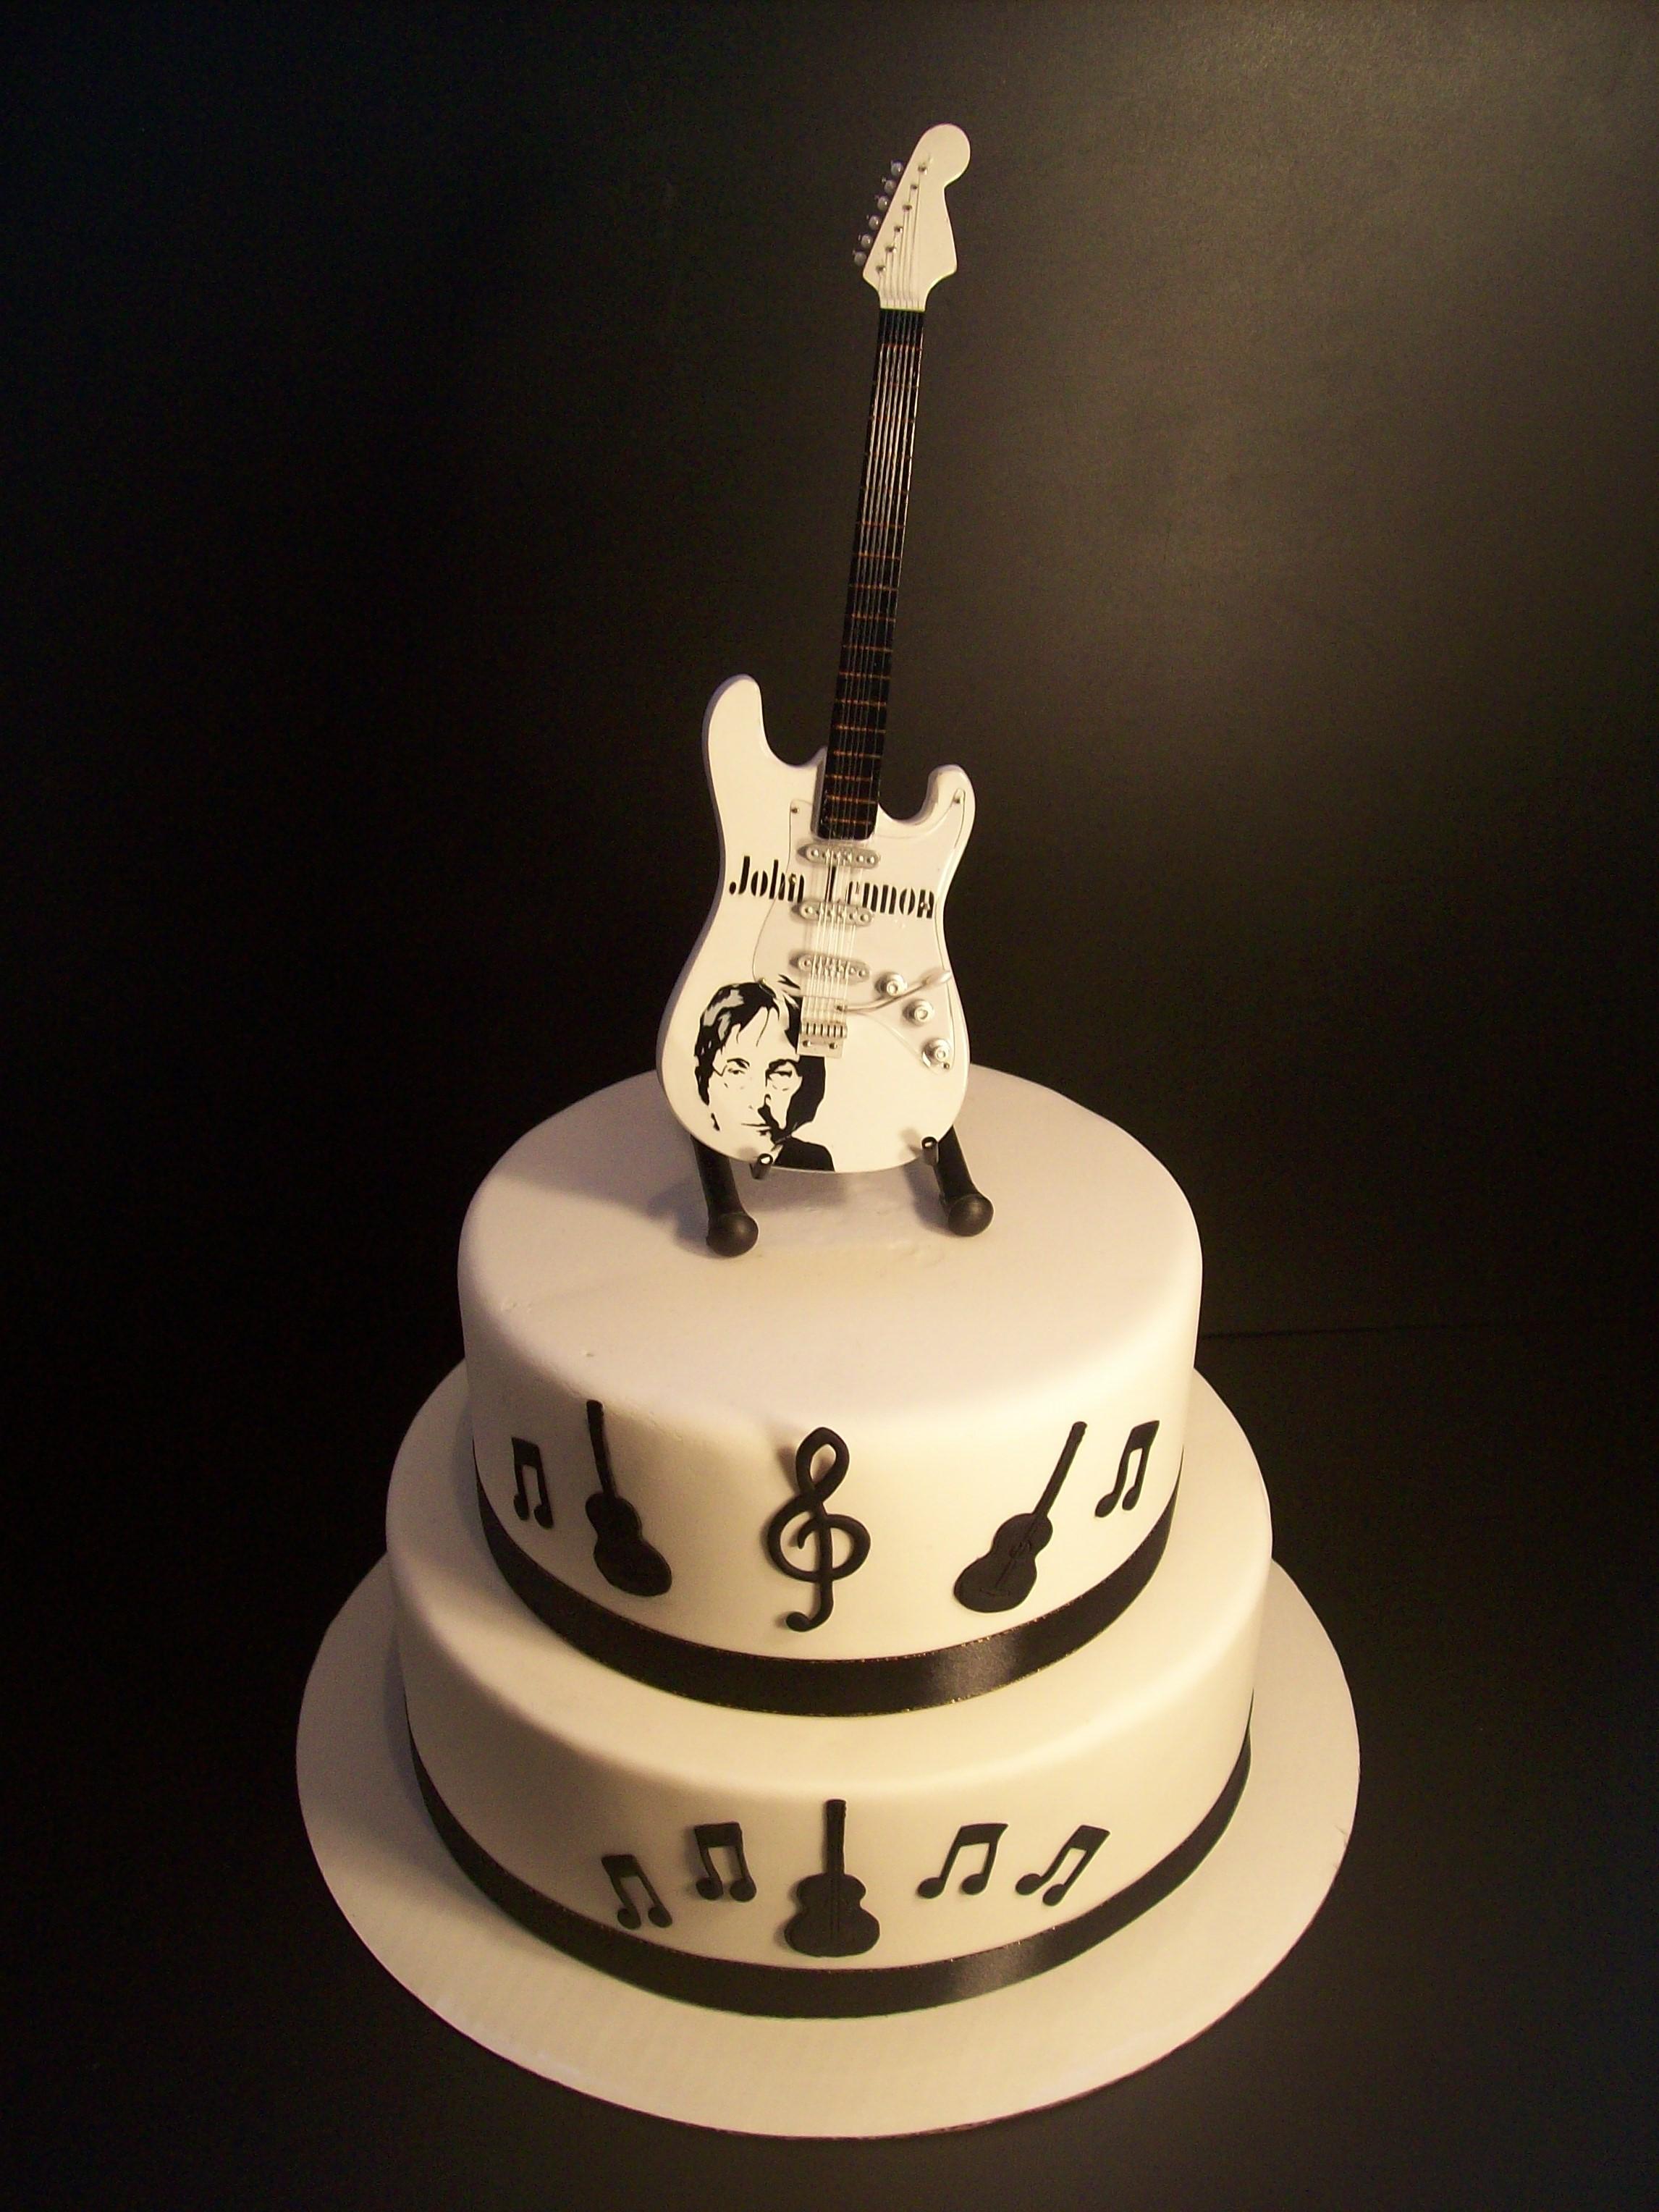 Guitar Cake 295 Temptation Cakes Temptation Cakes